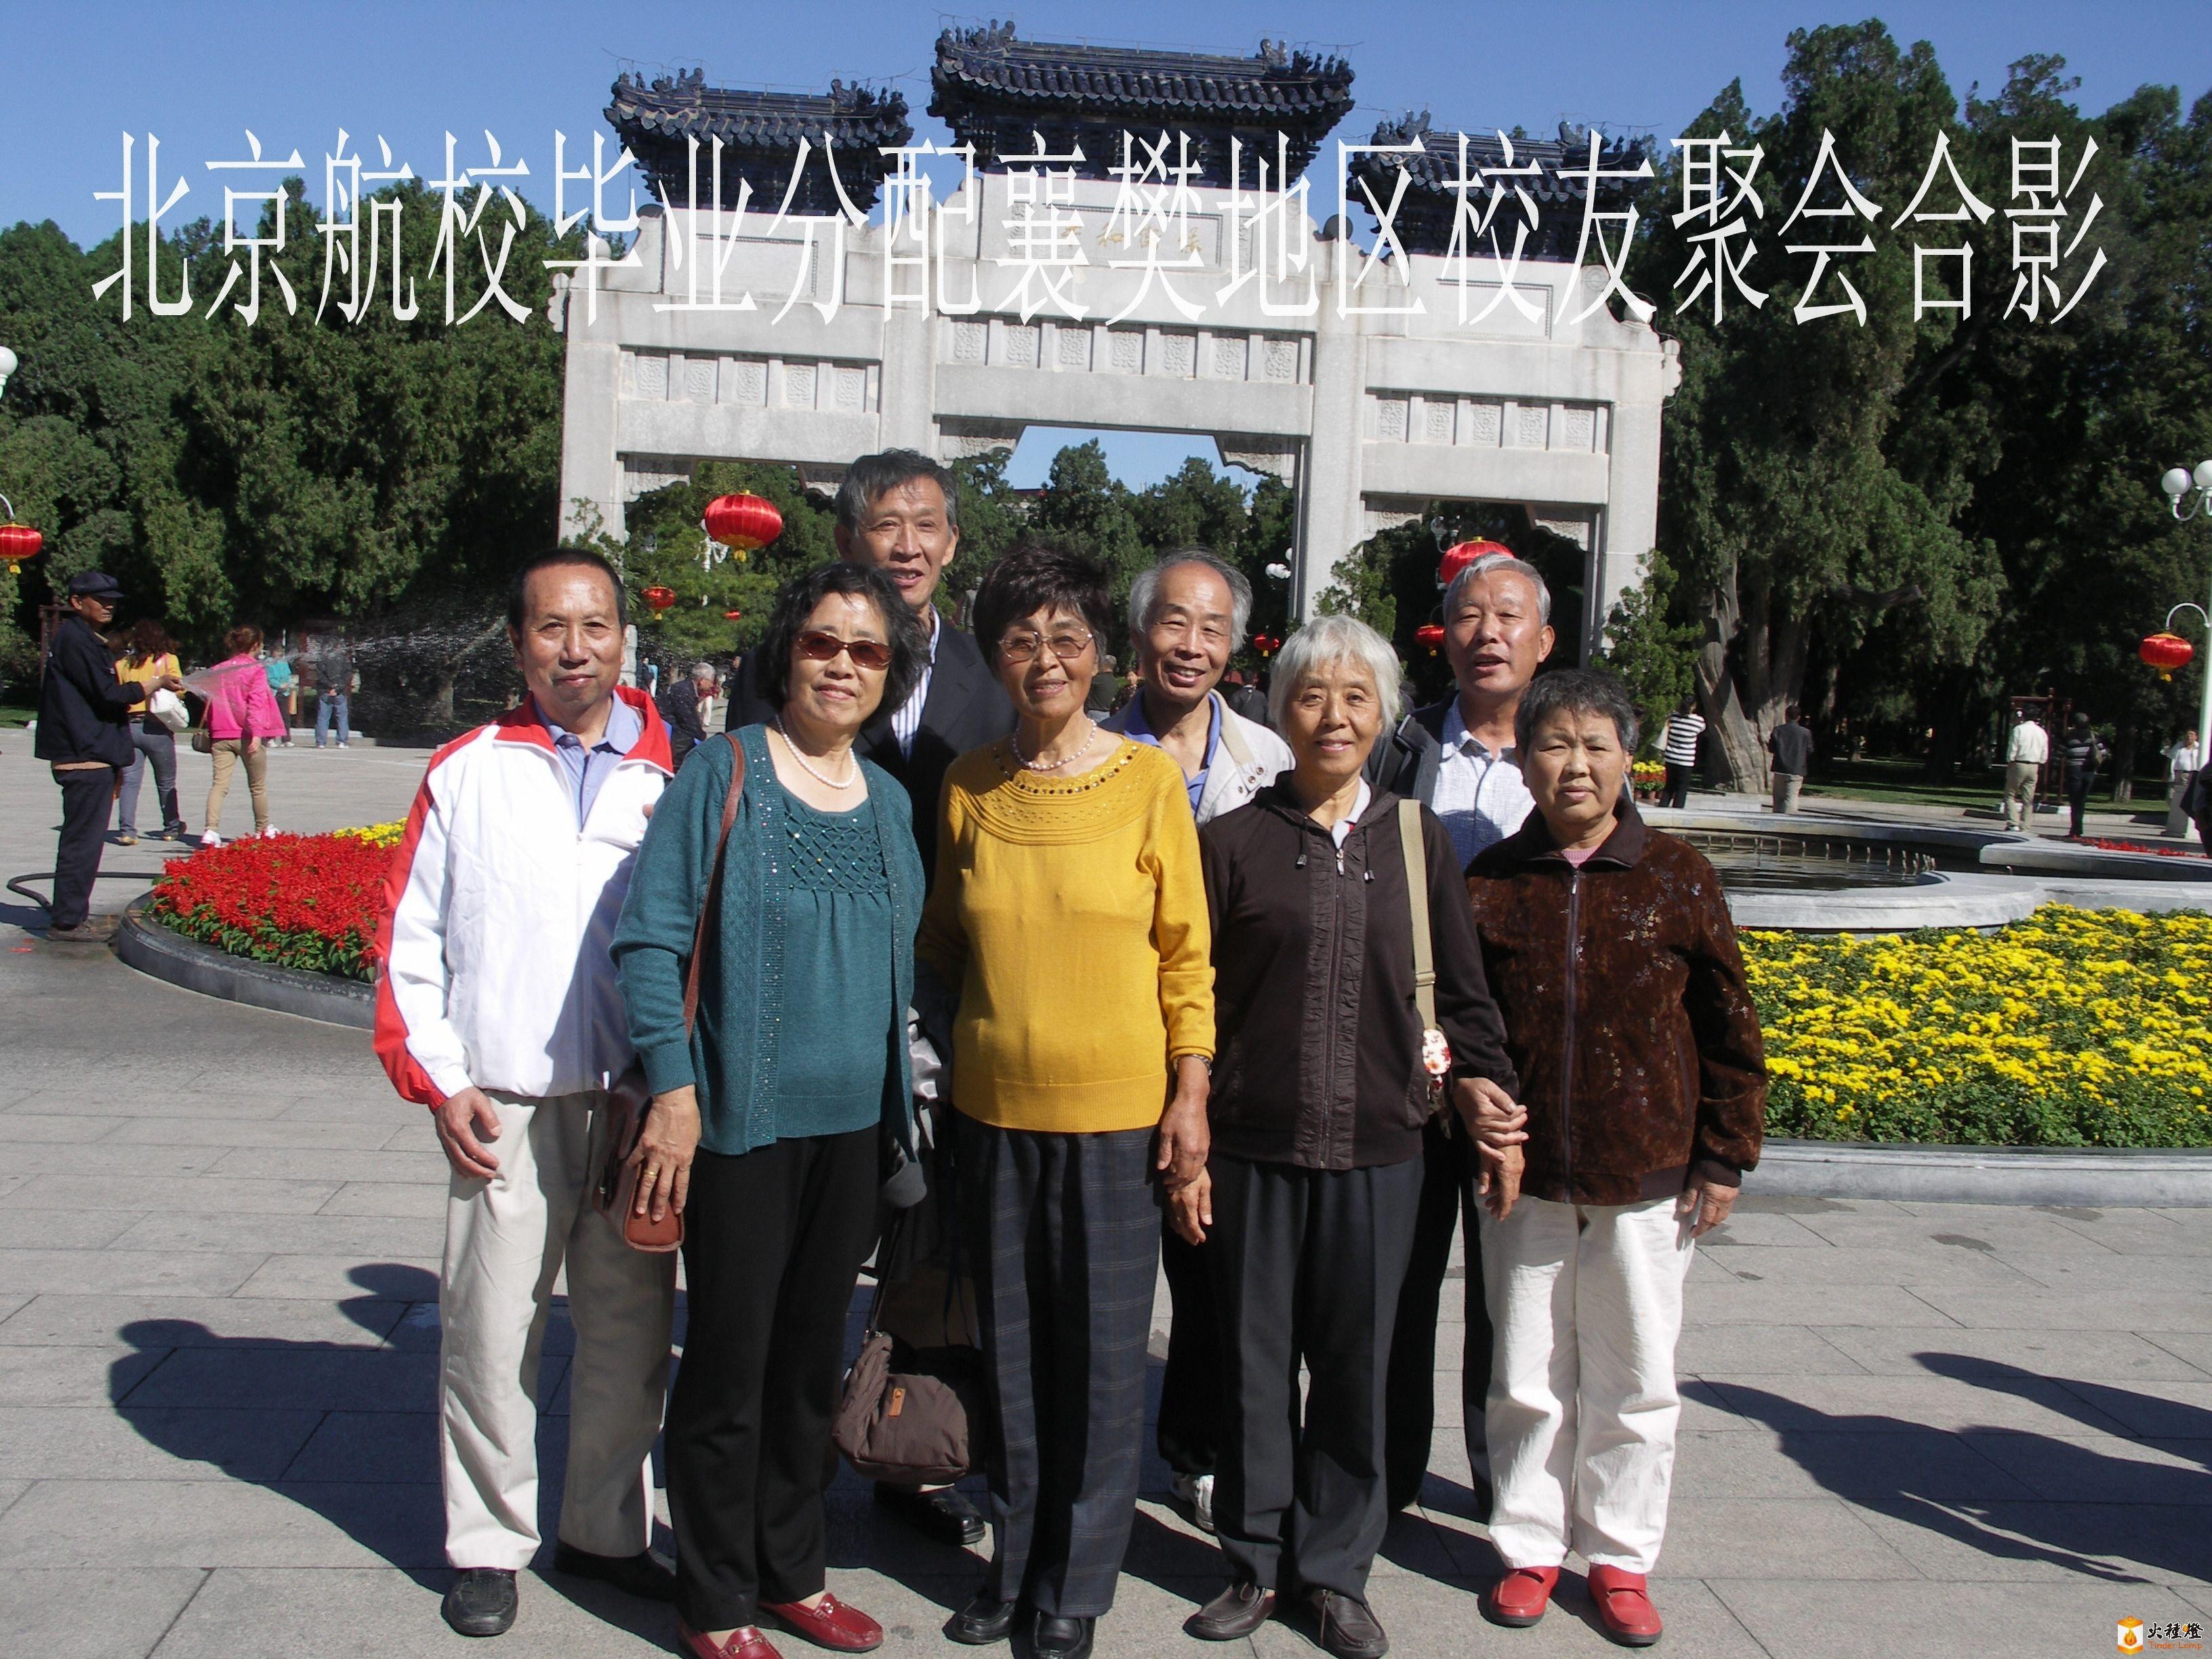 PICT0297_襄樊地区_conew1.jpg